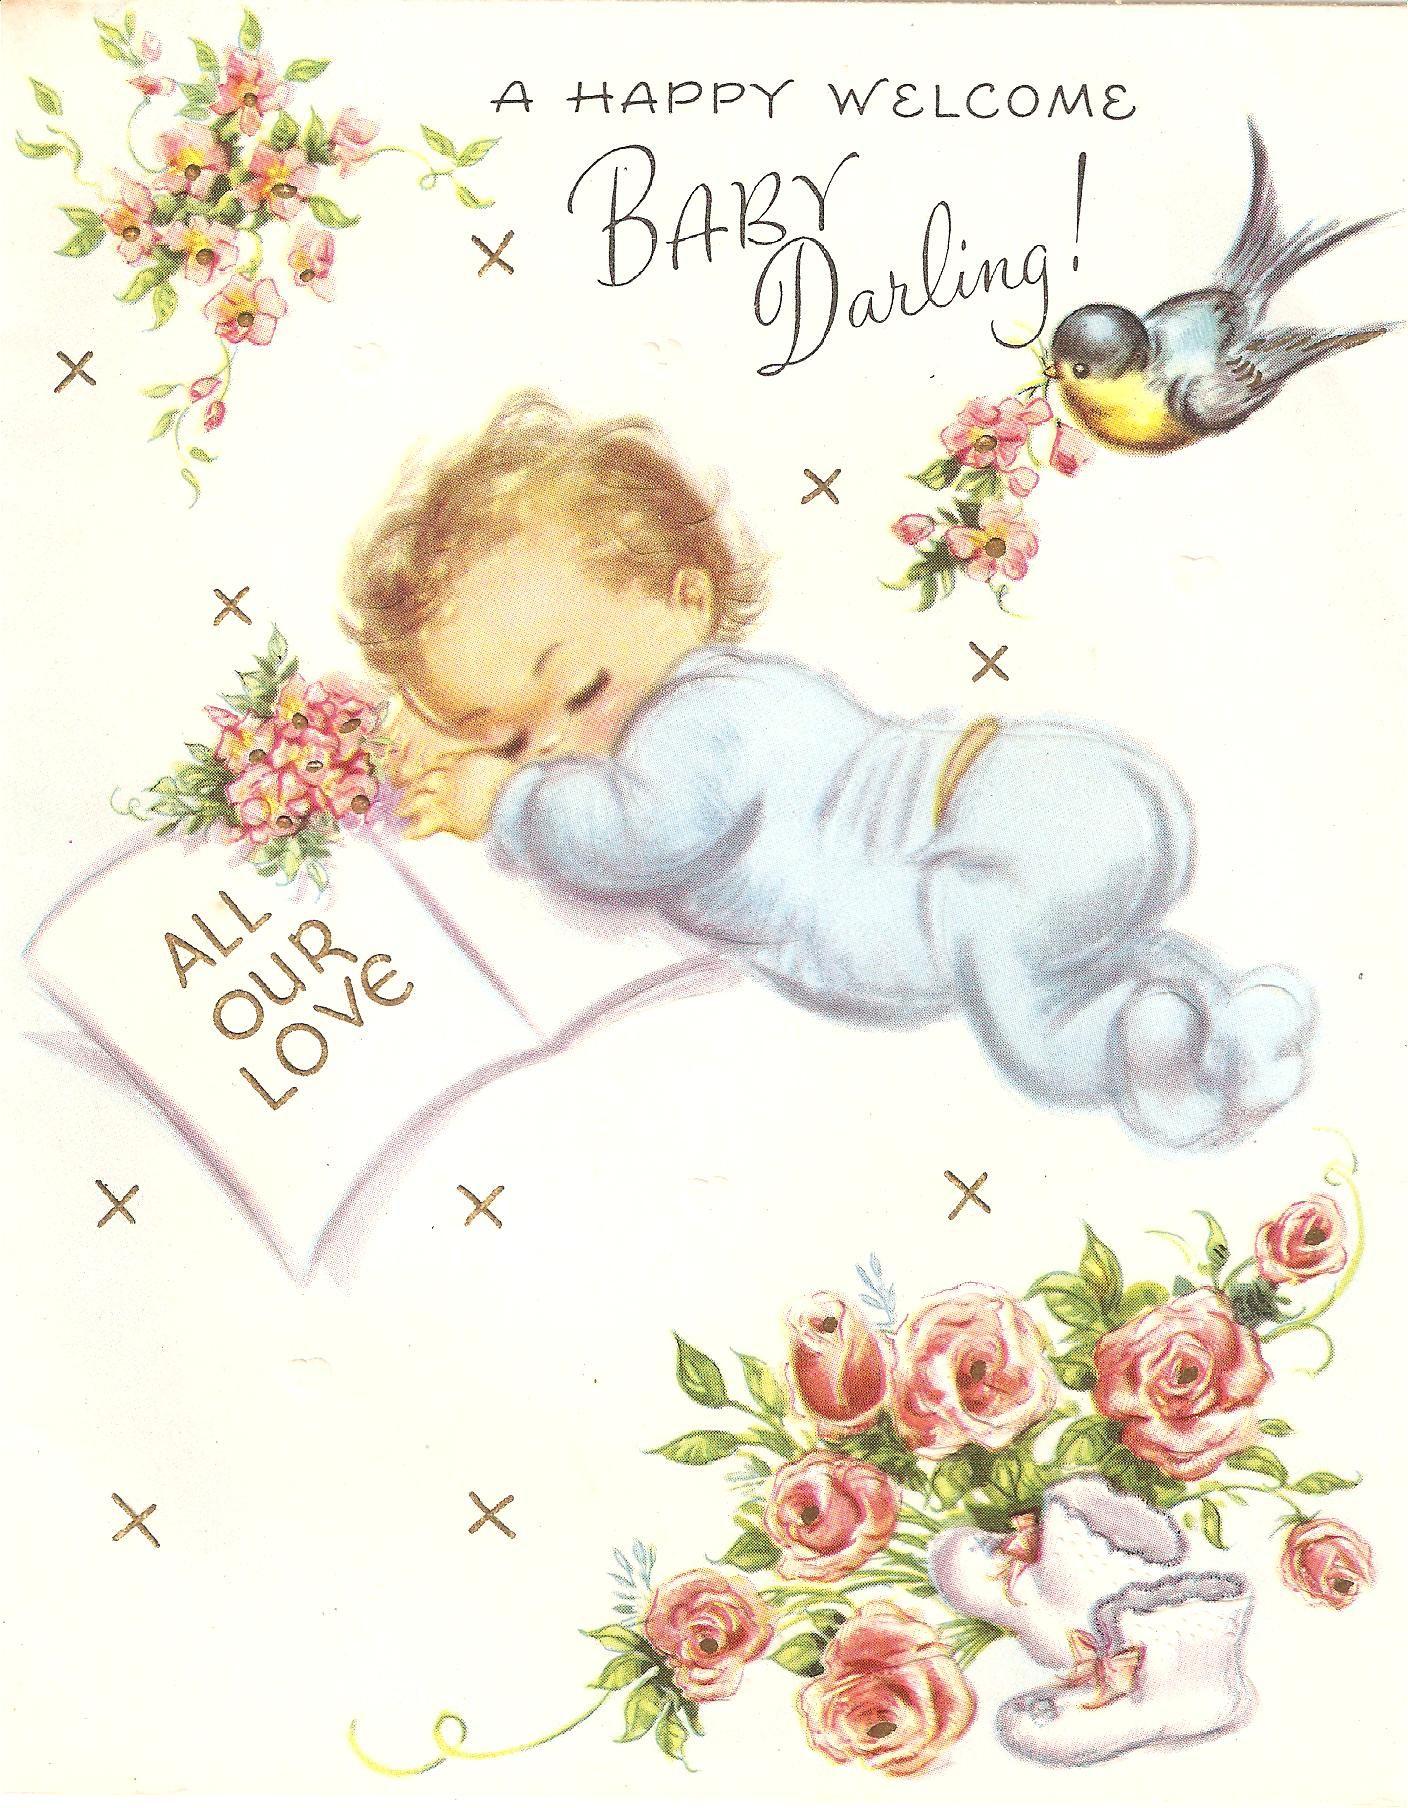 baby greeting card  circa 1960's  baby greeting cards